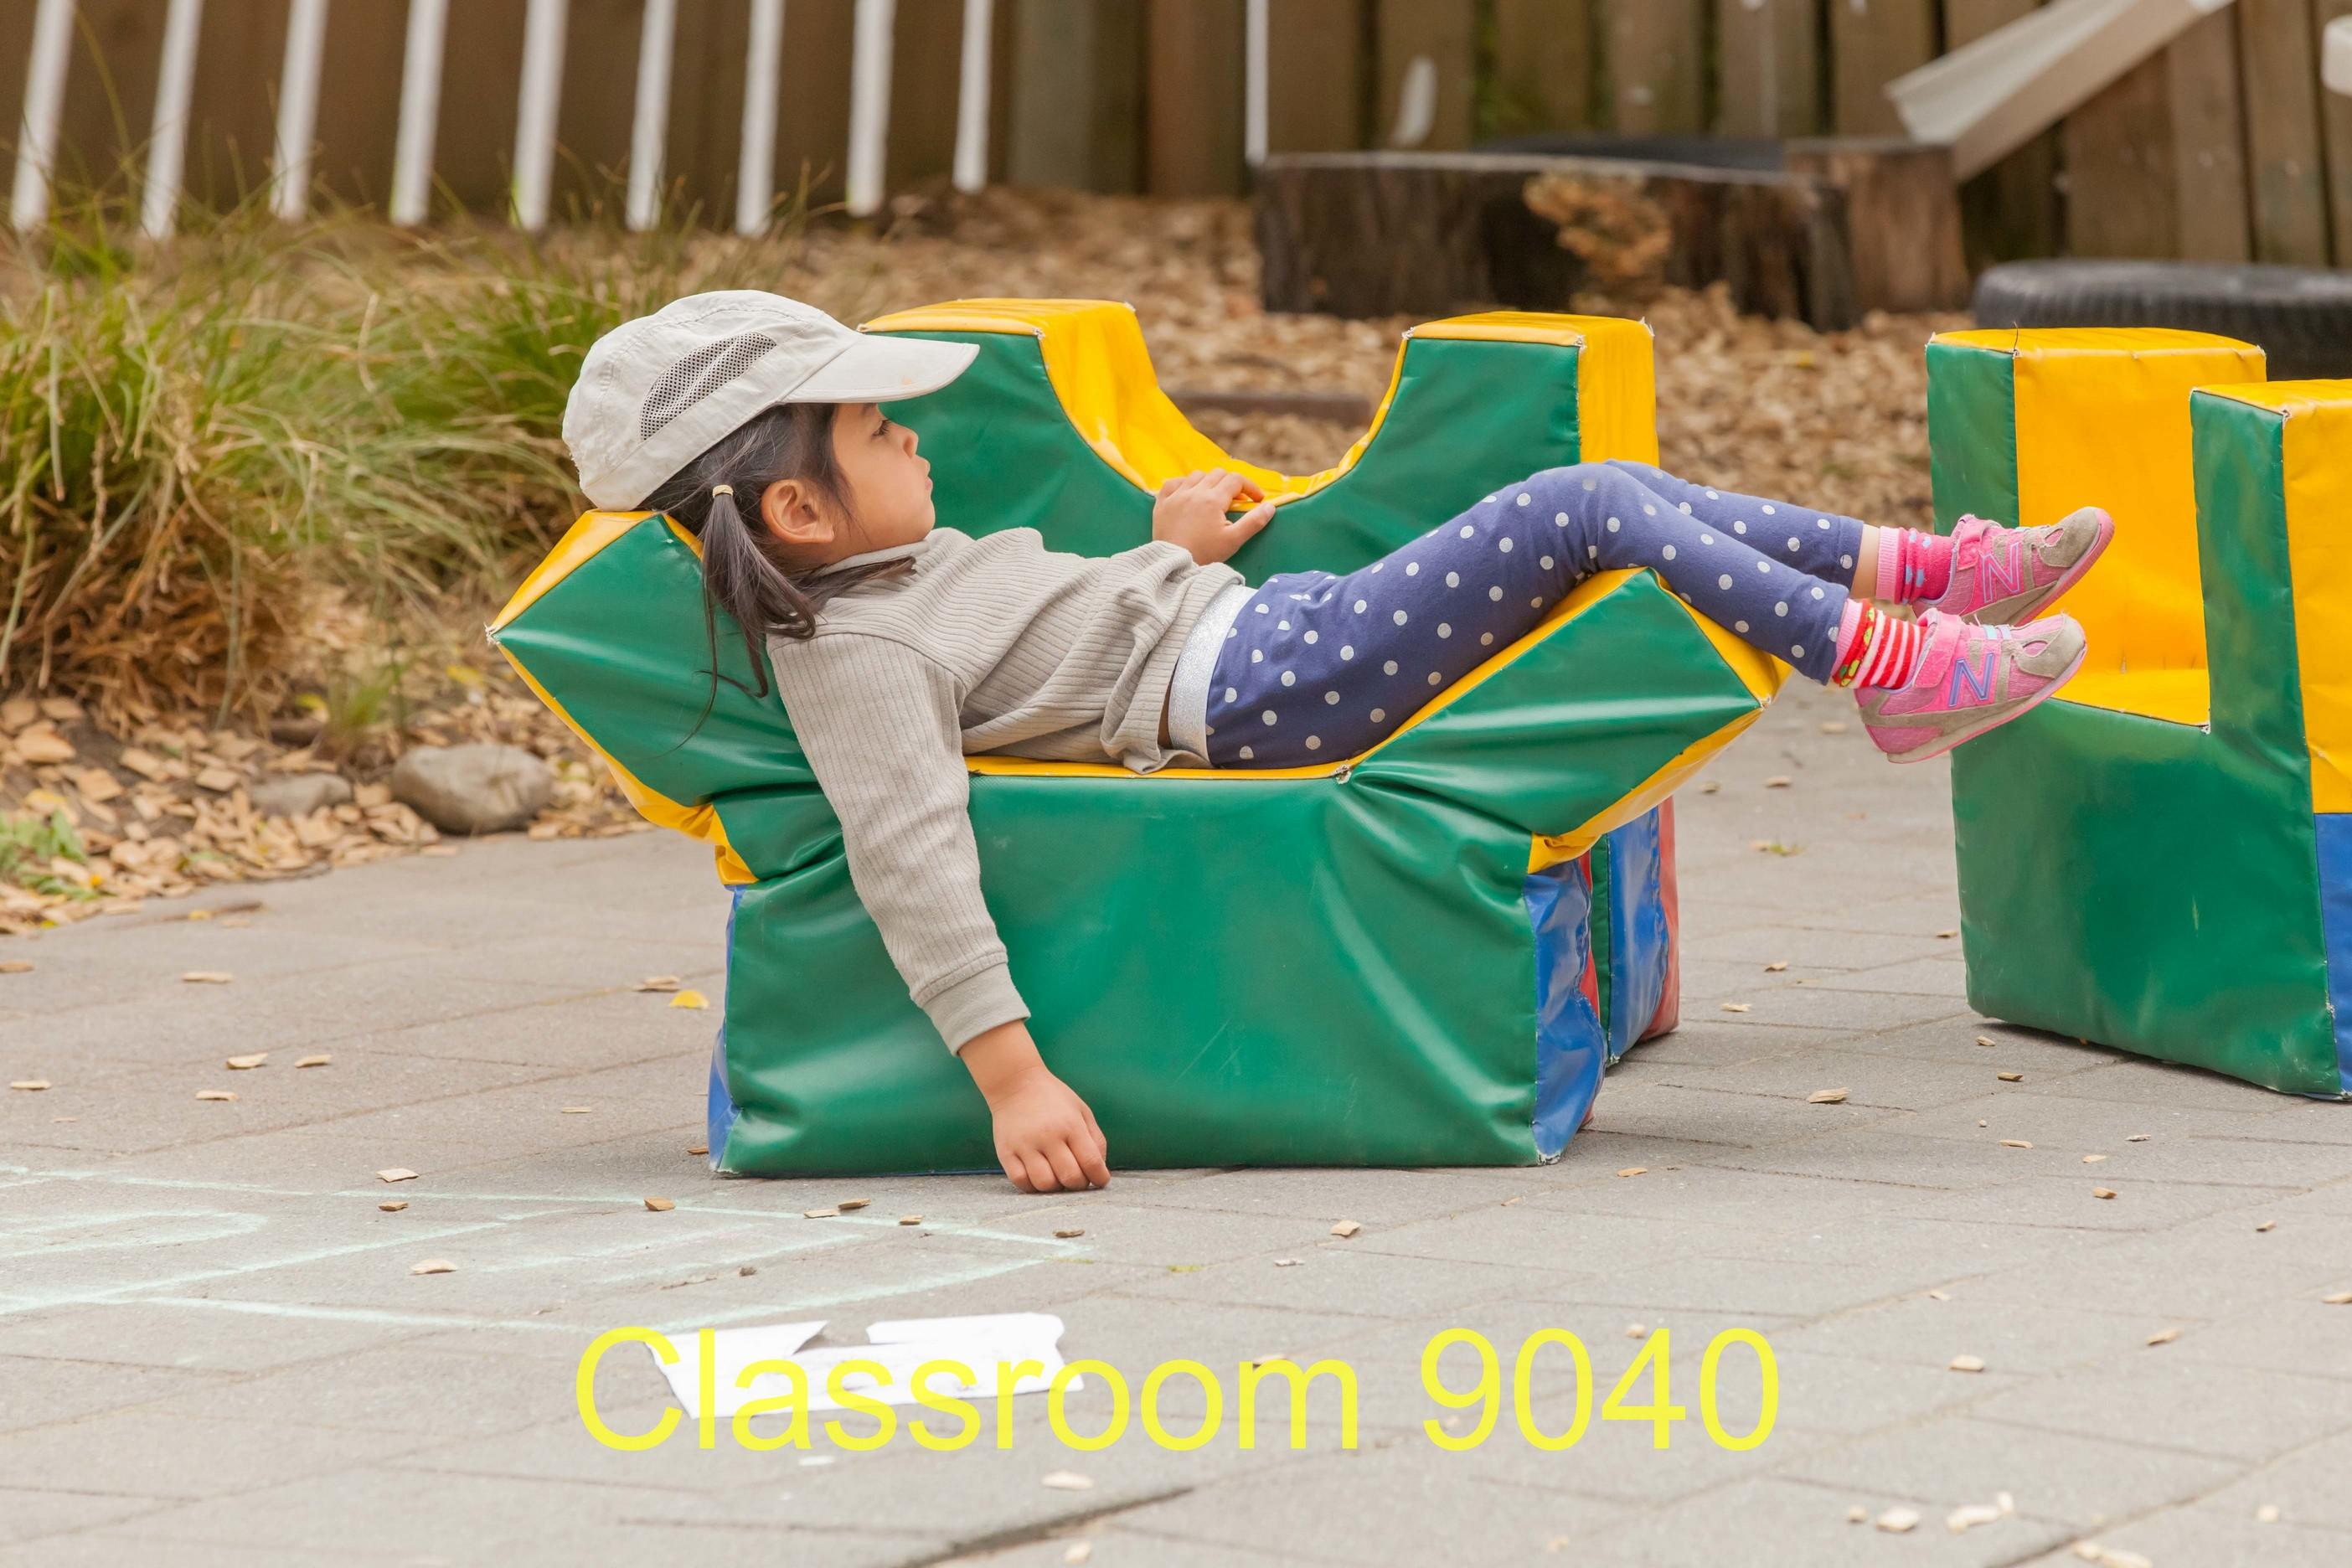 Classroom 9040